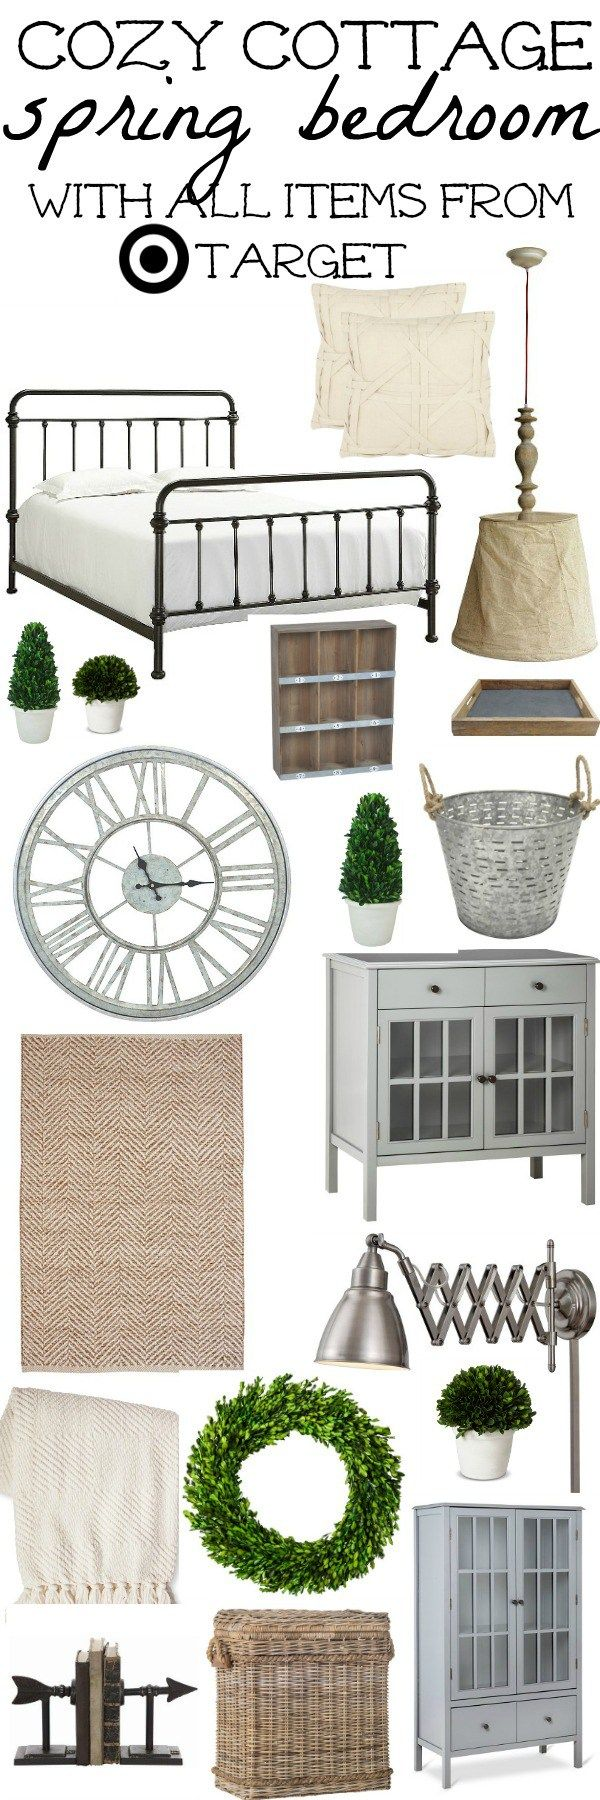 Bedroom Items. Cozy Cottage Spring Bedroom Design  Target and Bedrooms